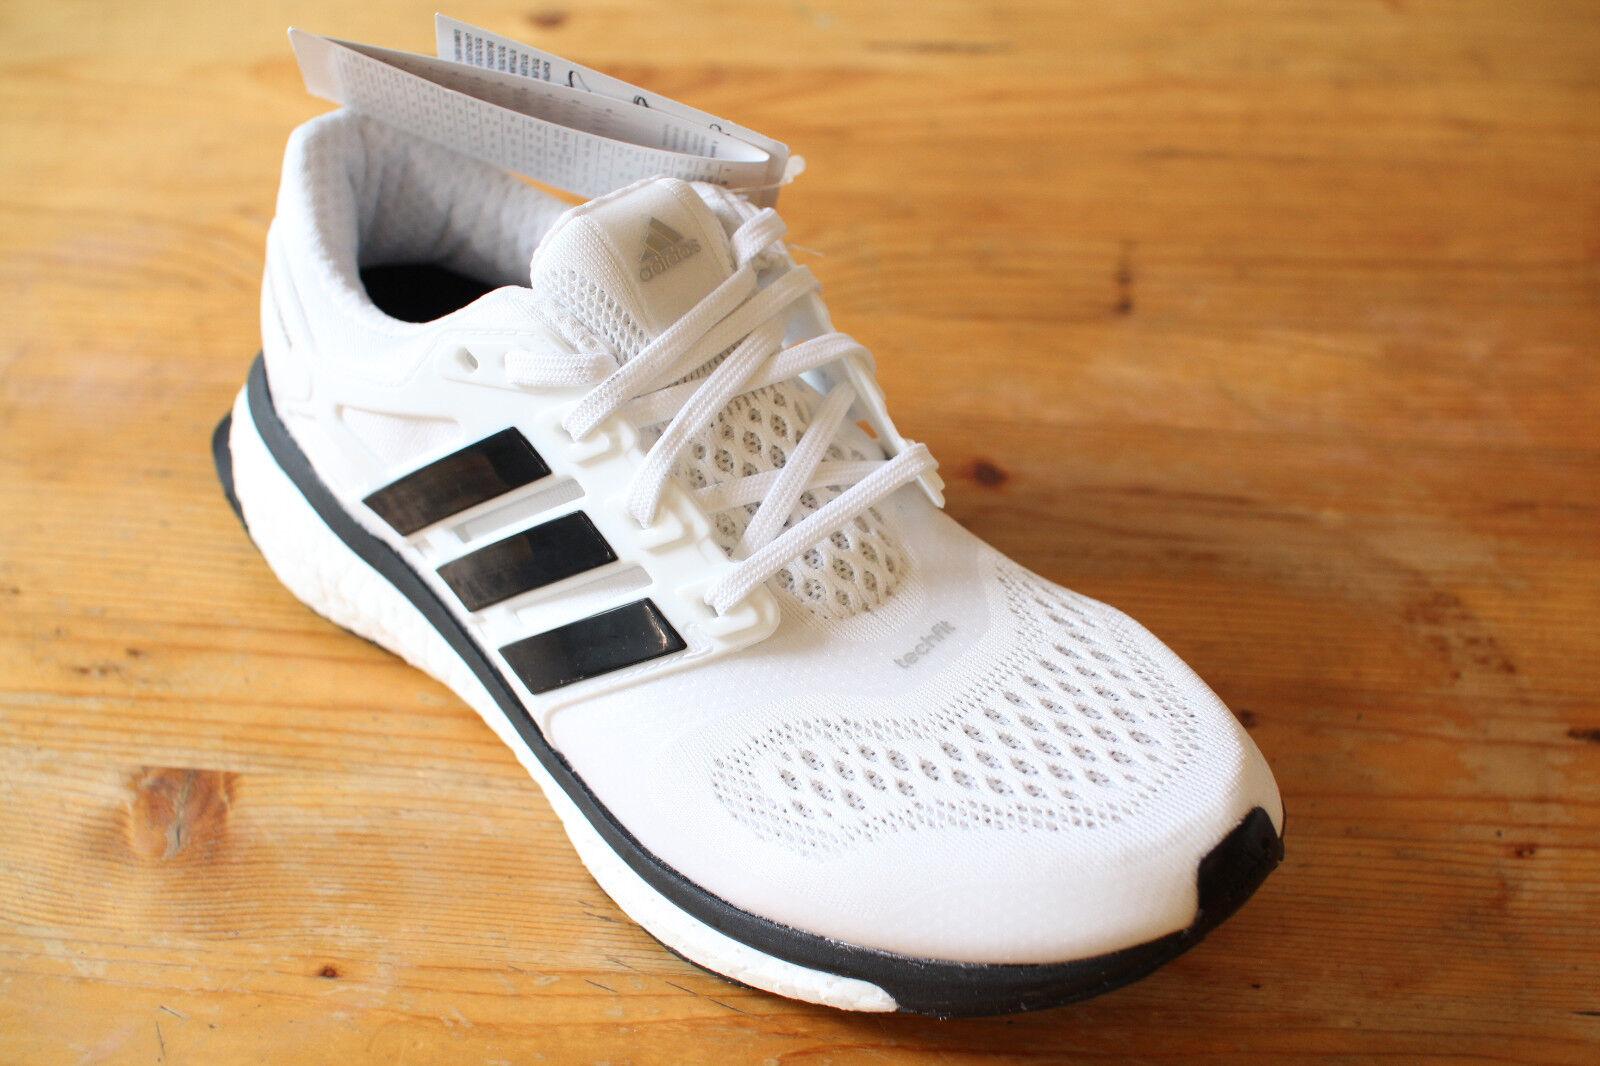 Adidas Energy Boost 2 ESM Schwarz Schwarz Schwarz Weiß Gr. 38,39,40,41,42 NEU & OVP b45127